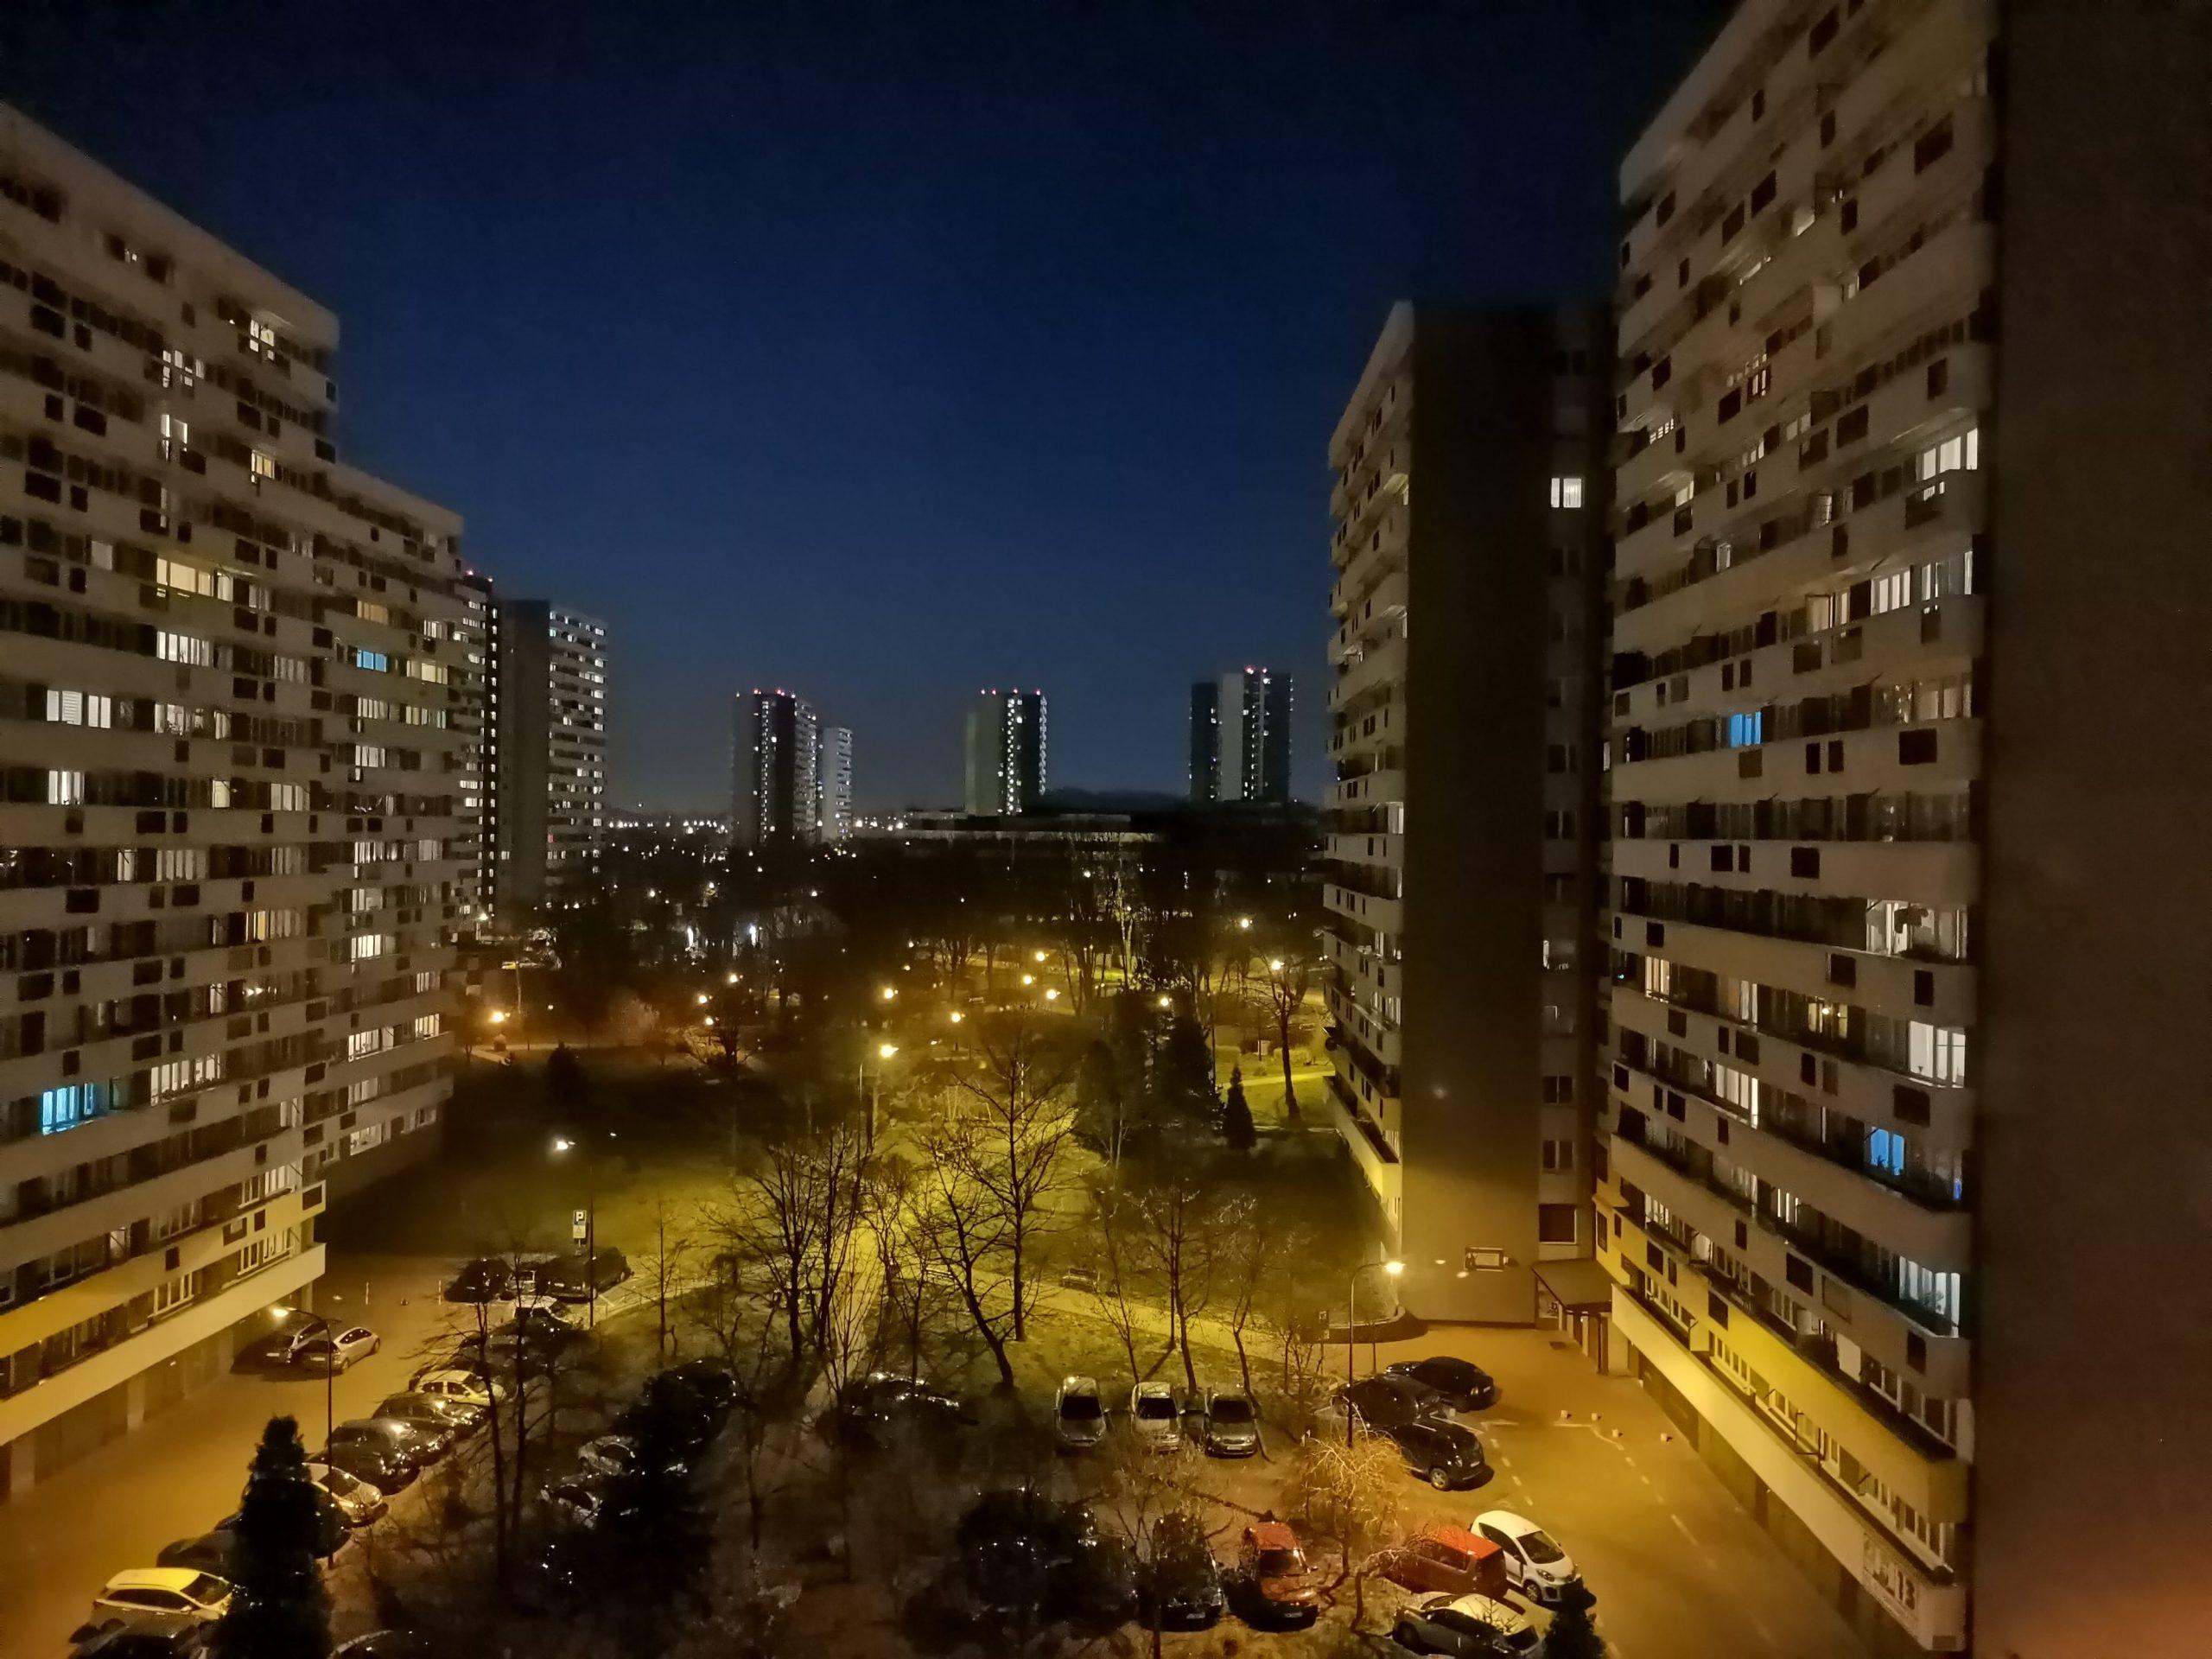 Zdjęcia nocne - Huawei P40 Lite